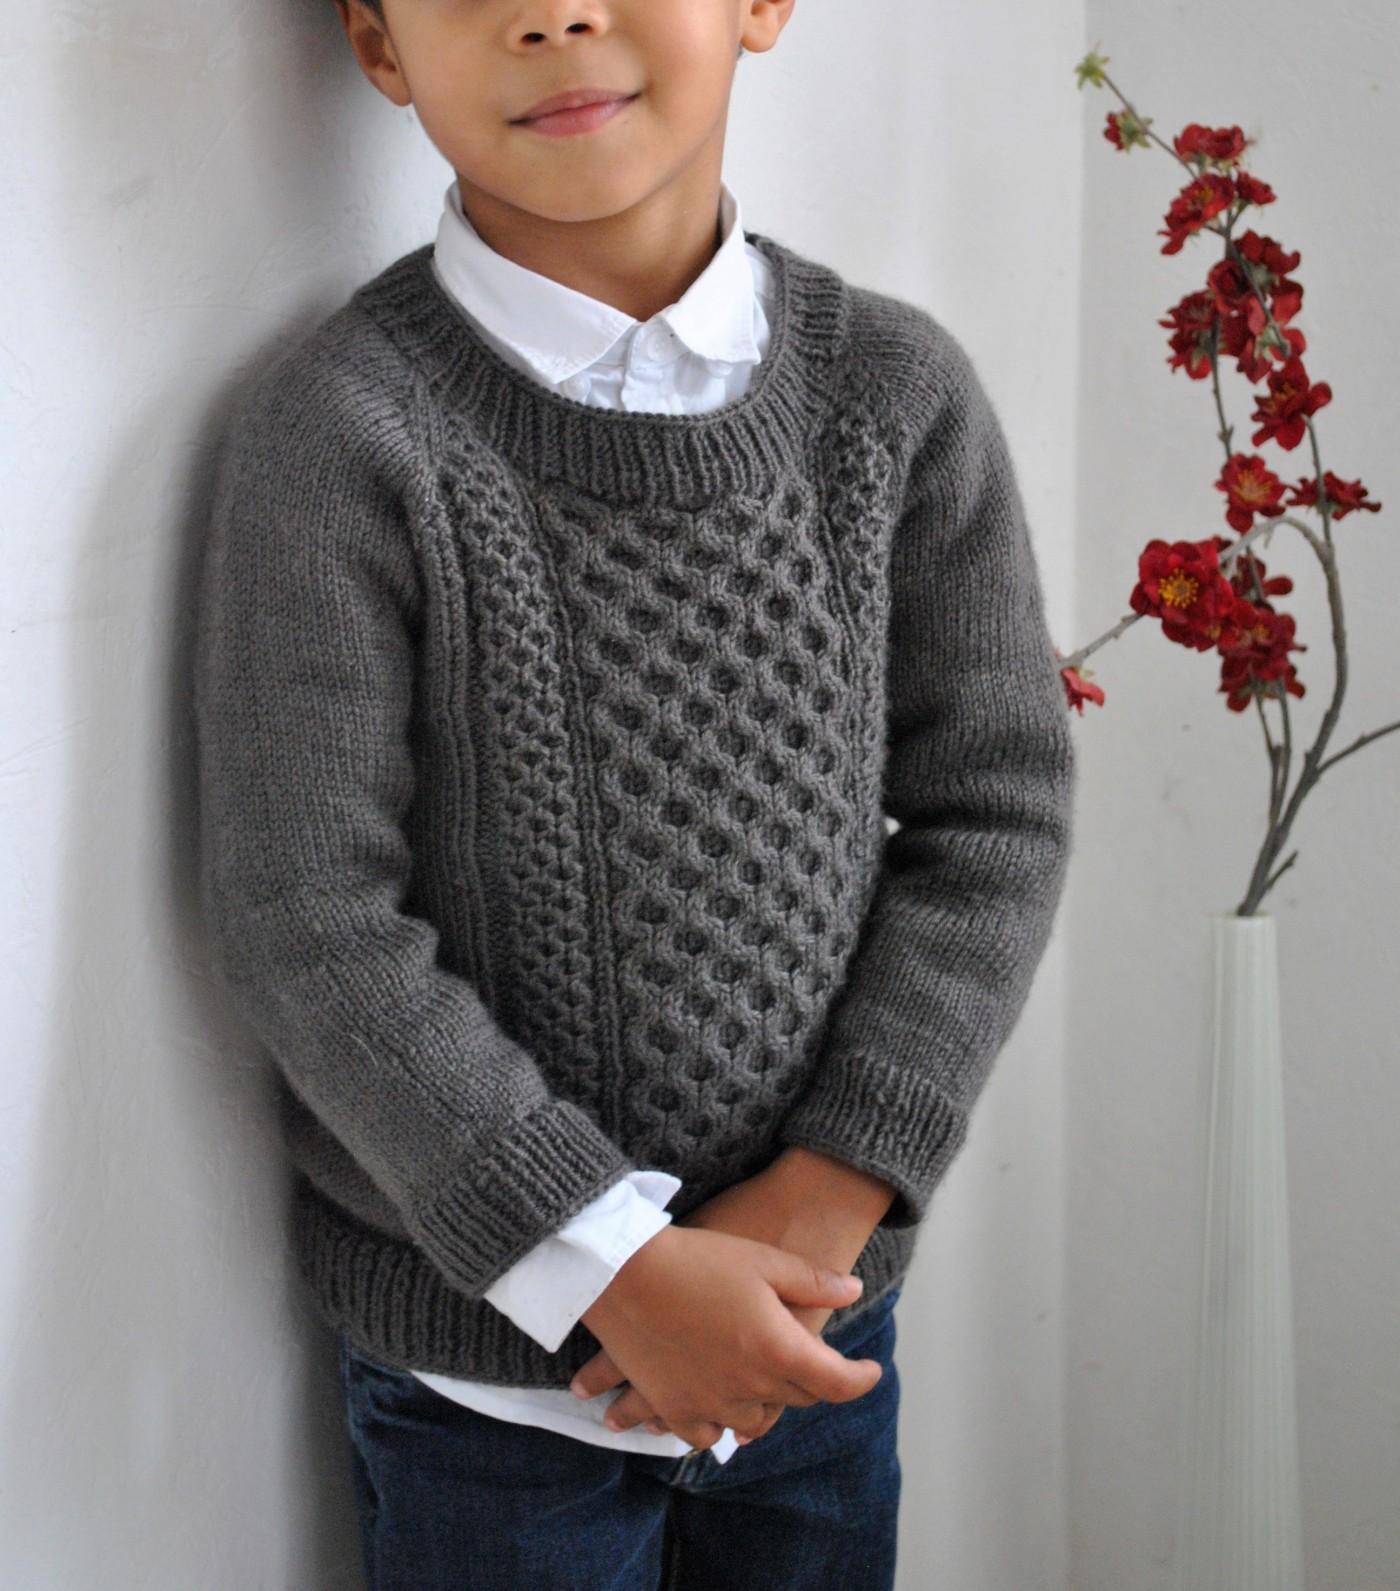 Mignon Lete's knit